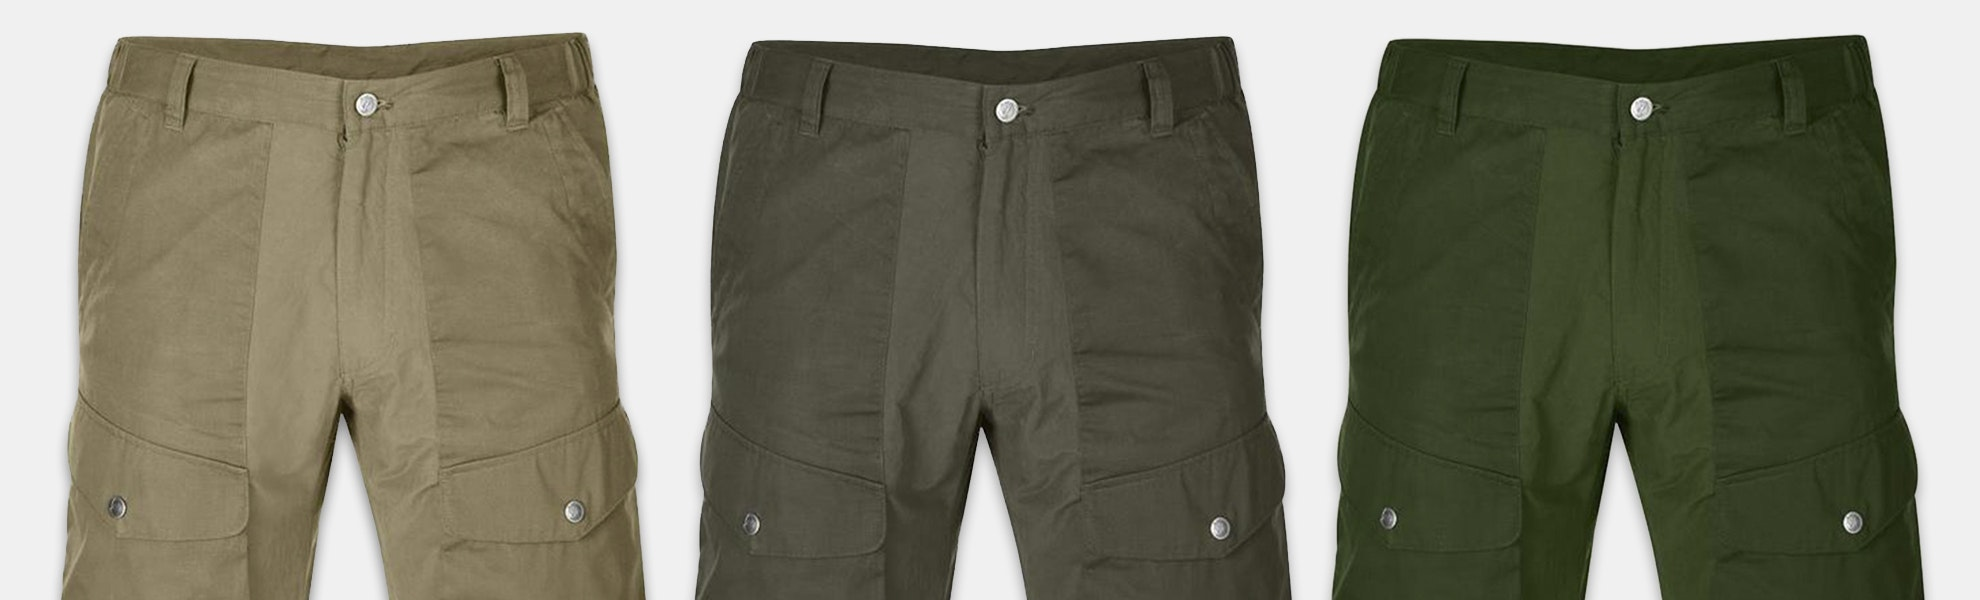 Fjallraven Men's Abisko Hybrid & Abisko Shorts